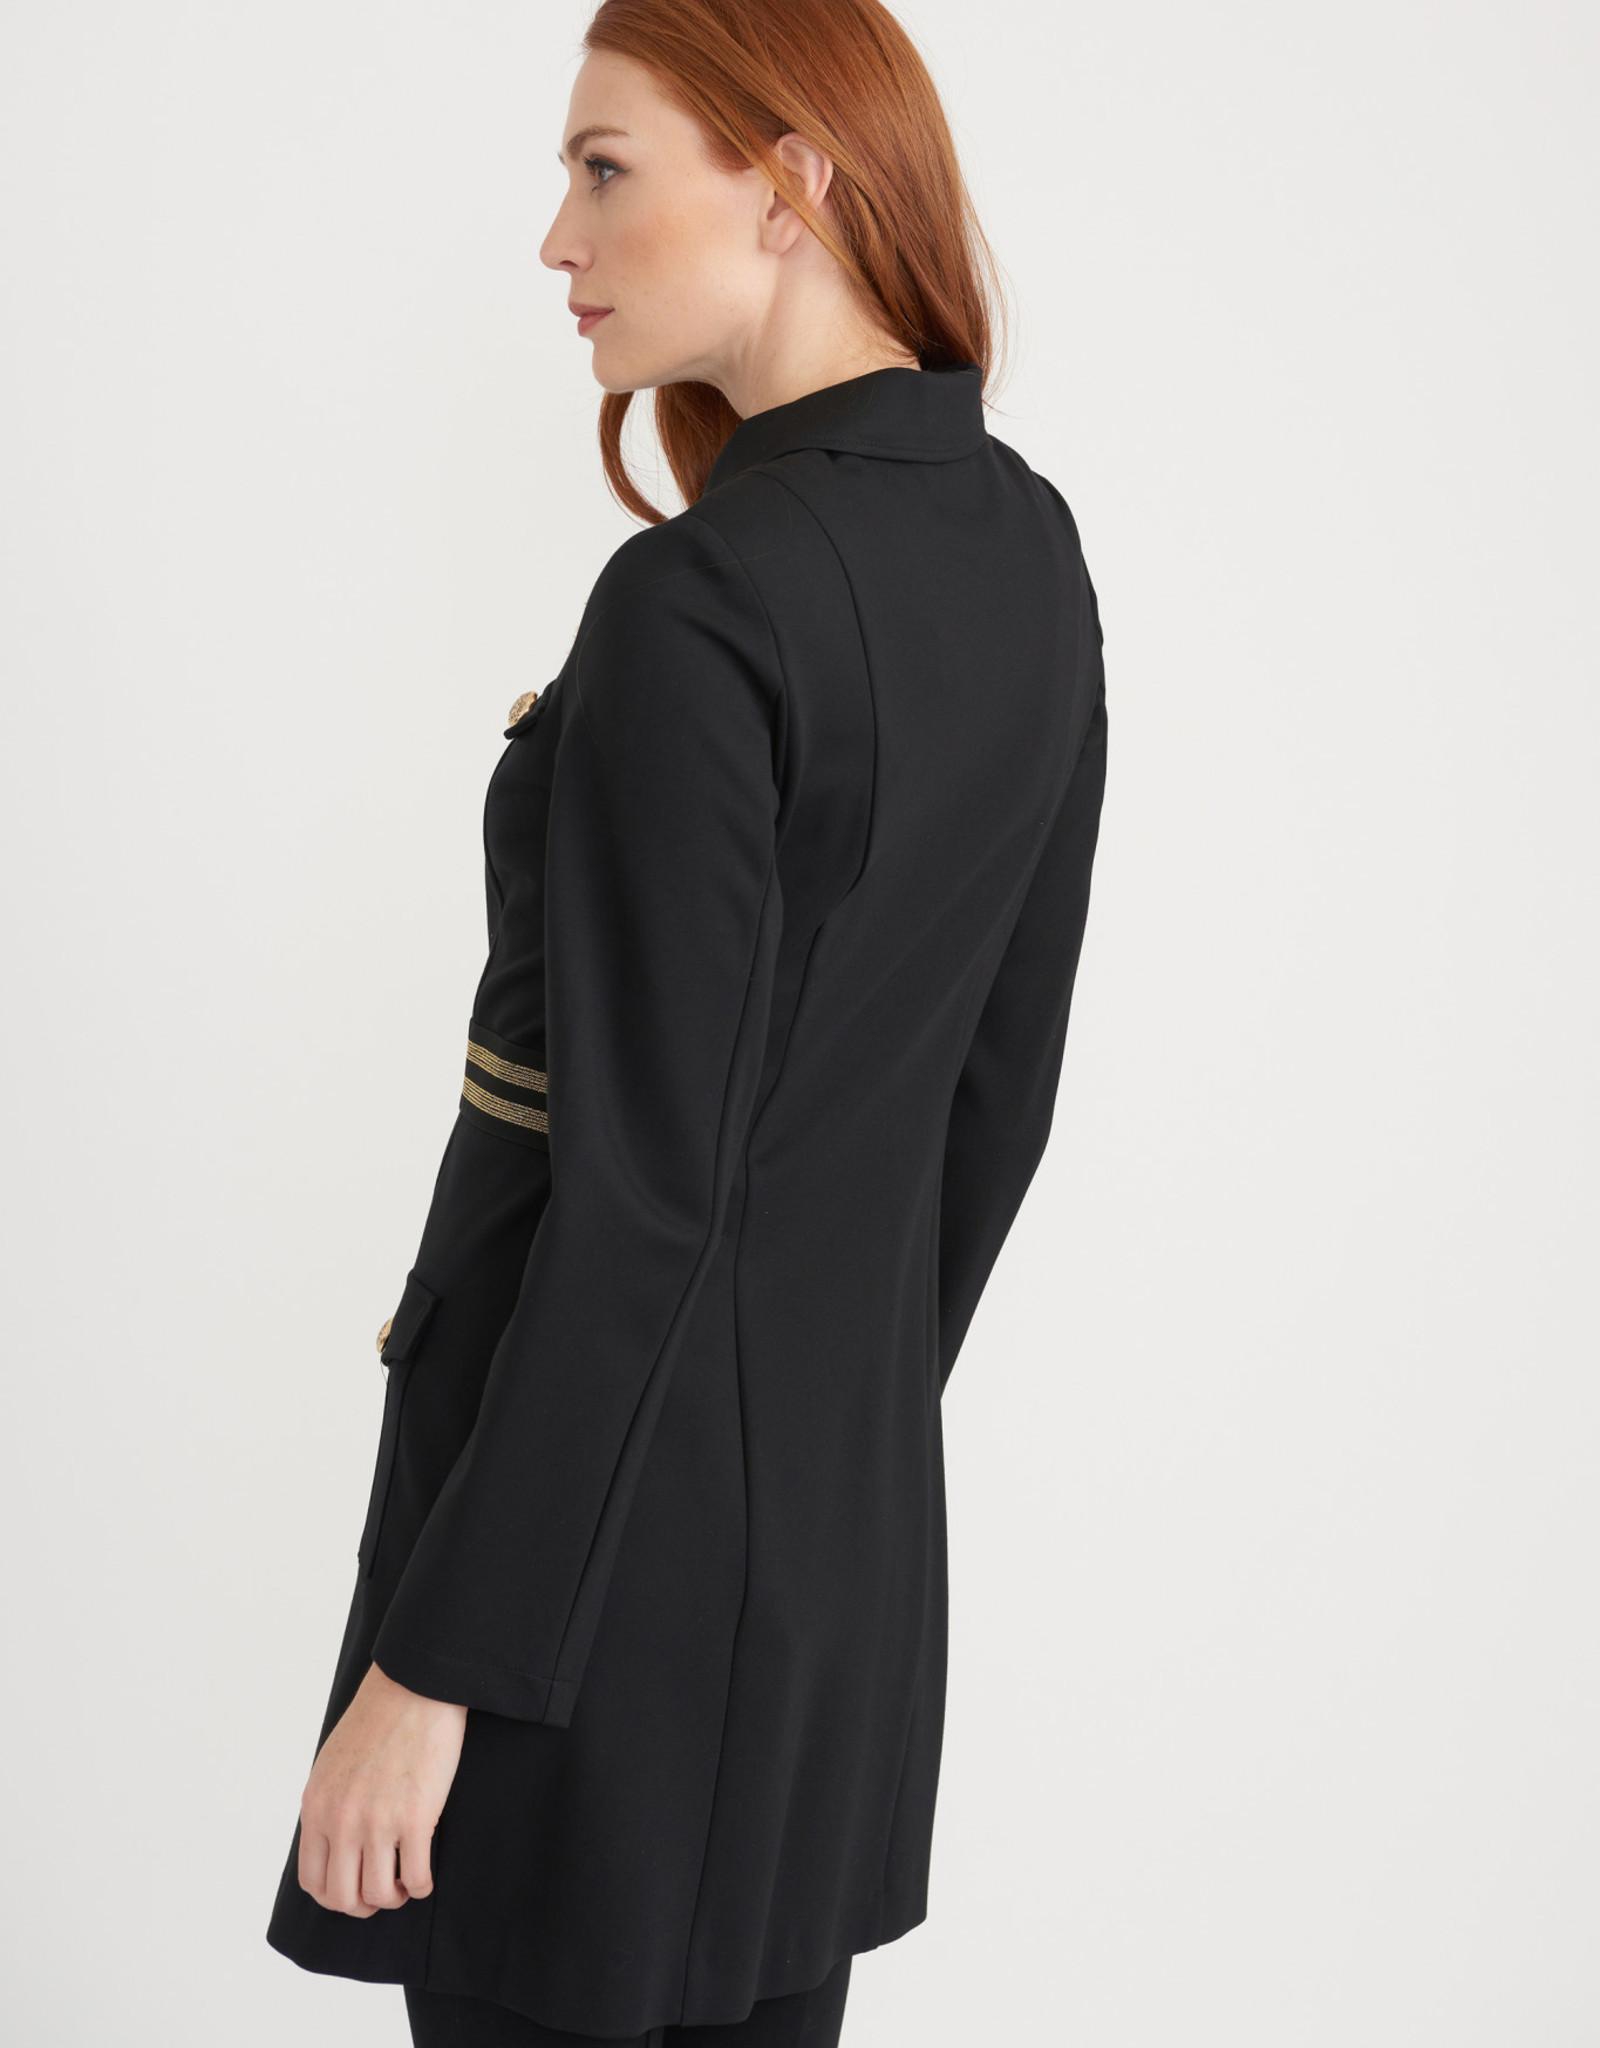 Joseph Ribkoff Jacket Style Militaire Boutons Dorés Joseph Ribkoff 203618